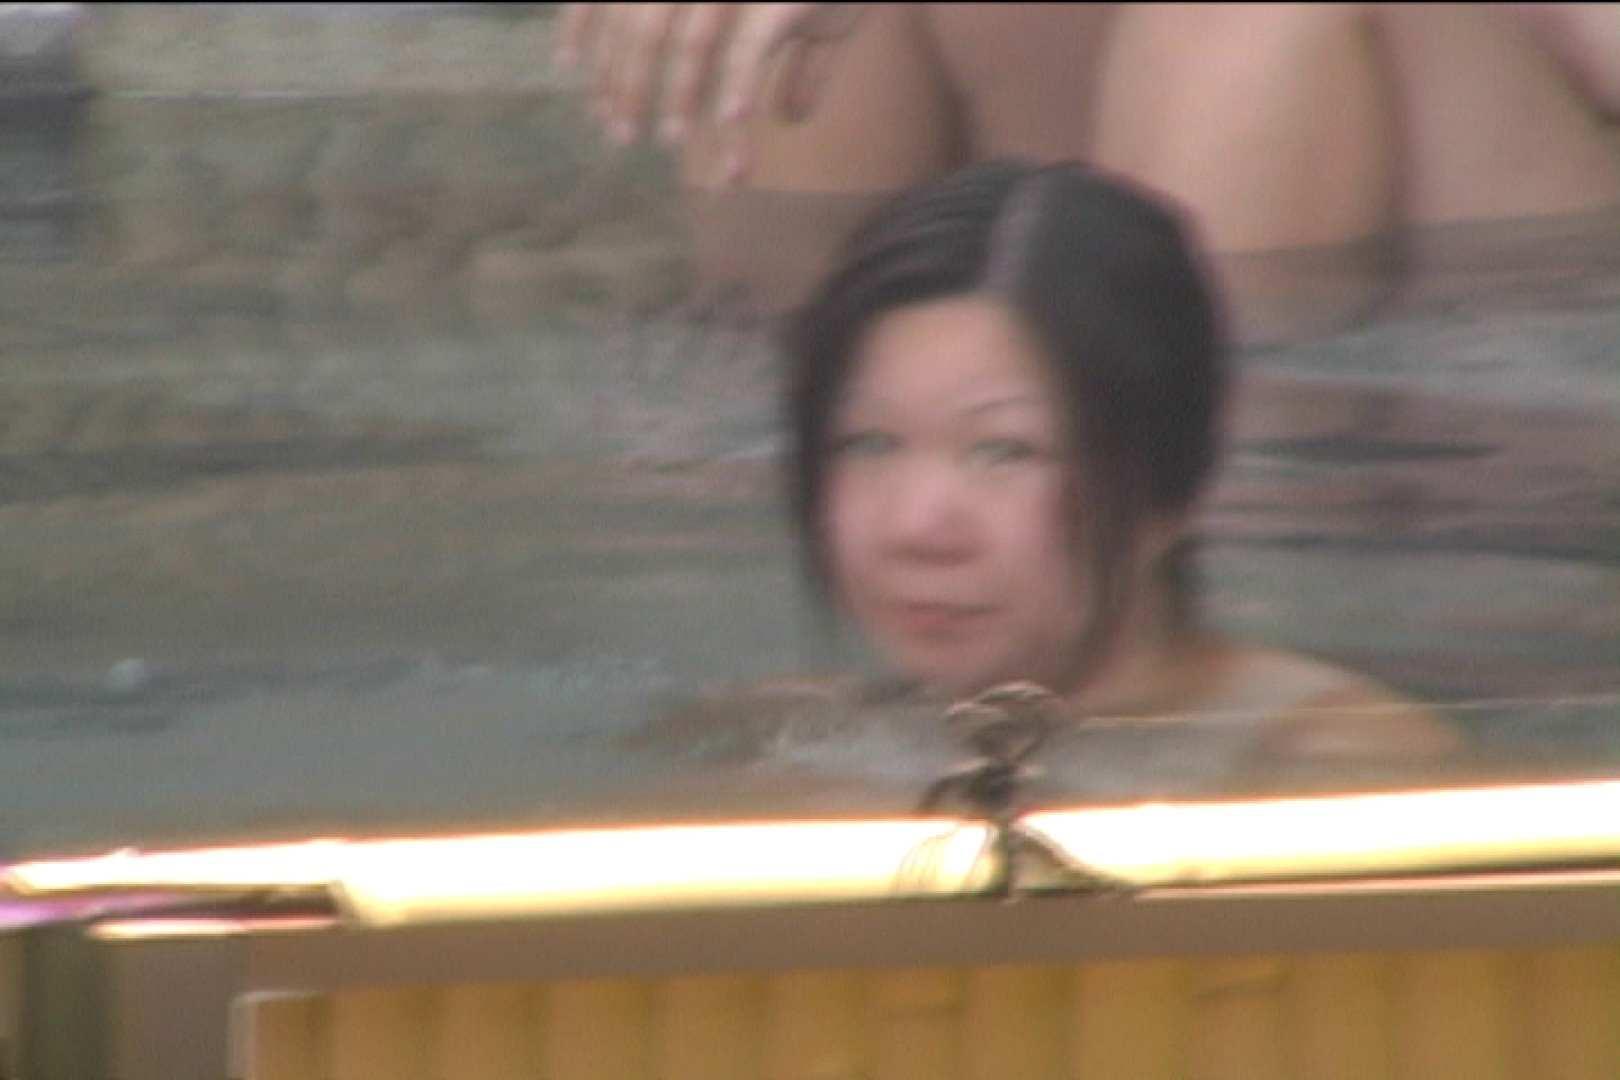 Aquaな露天風呂Vol.527 0  88連発 66